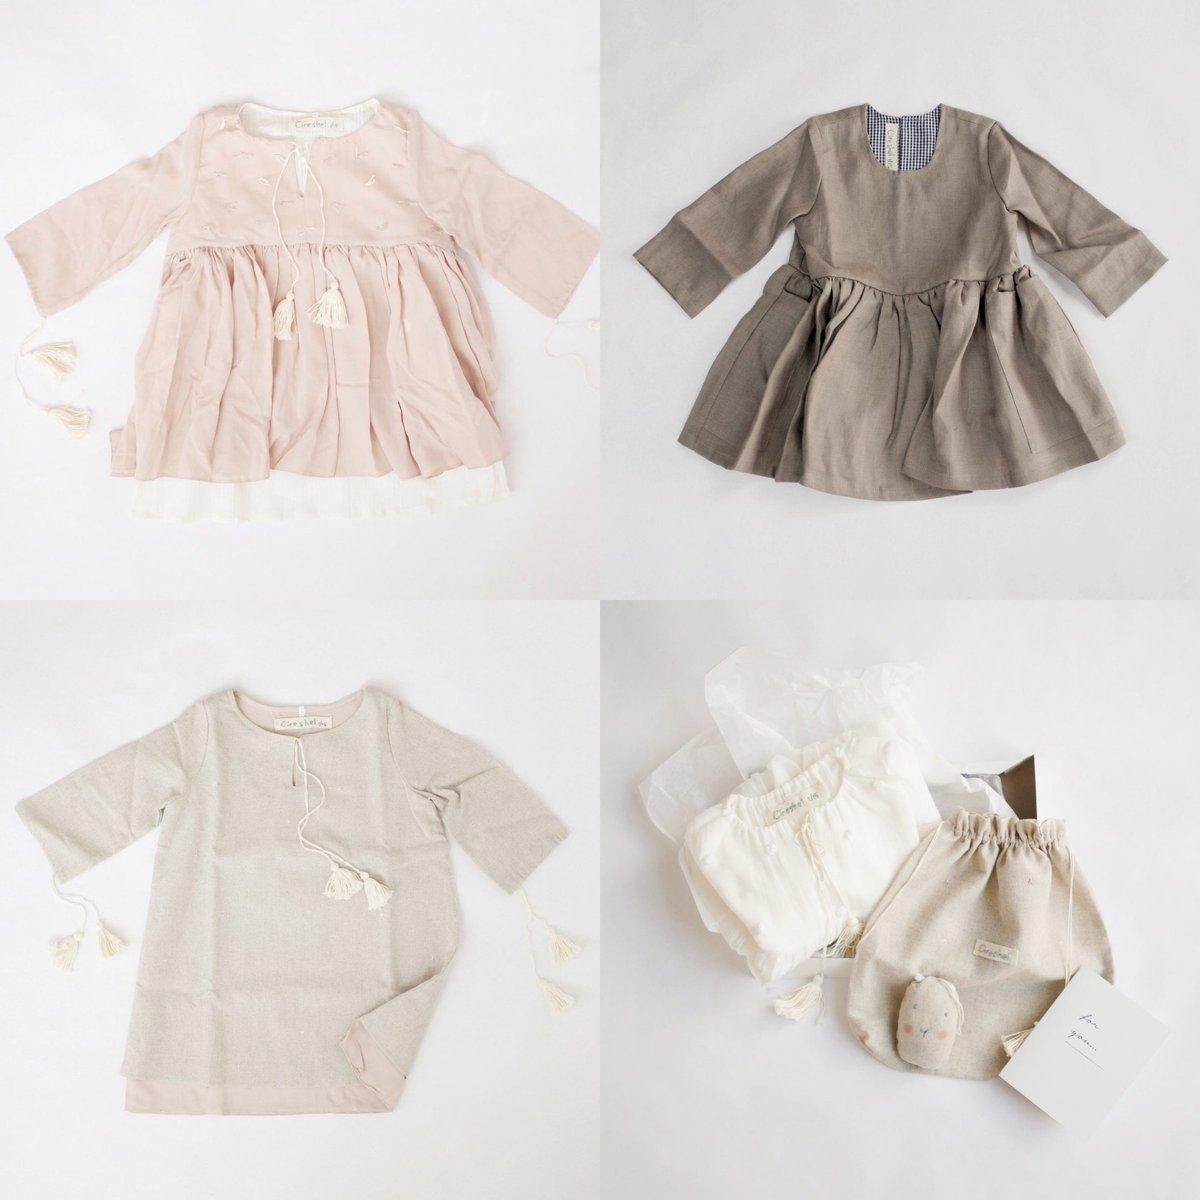 Image of Rosie / Ivy / Autumn / Gift Set